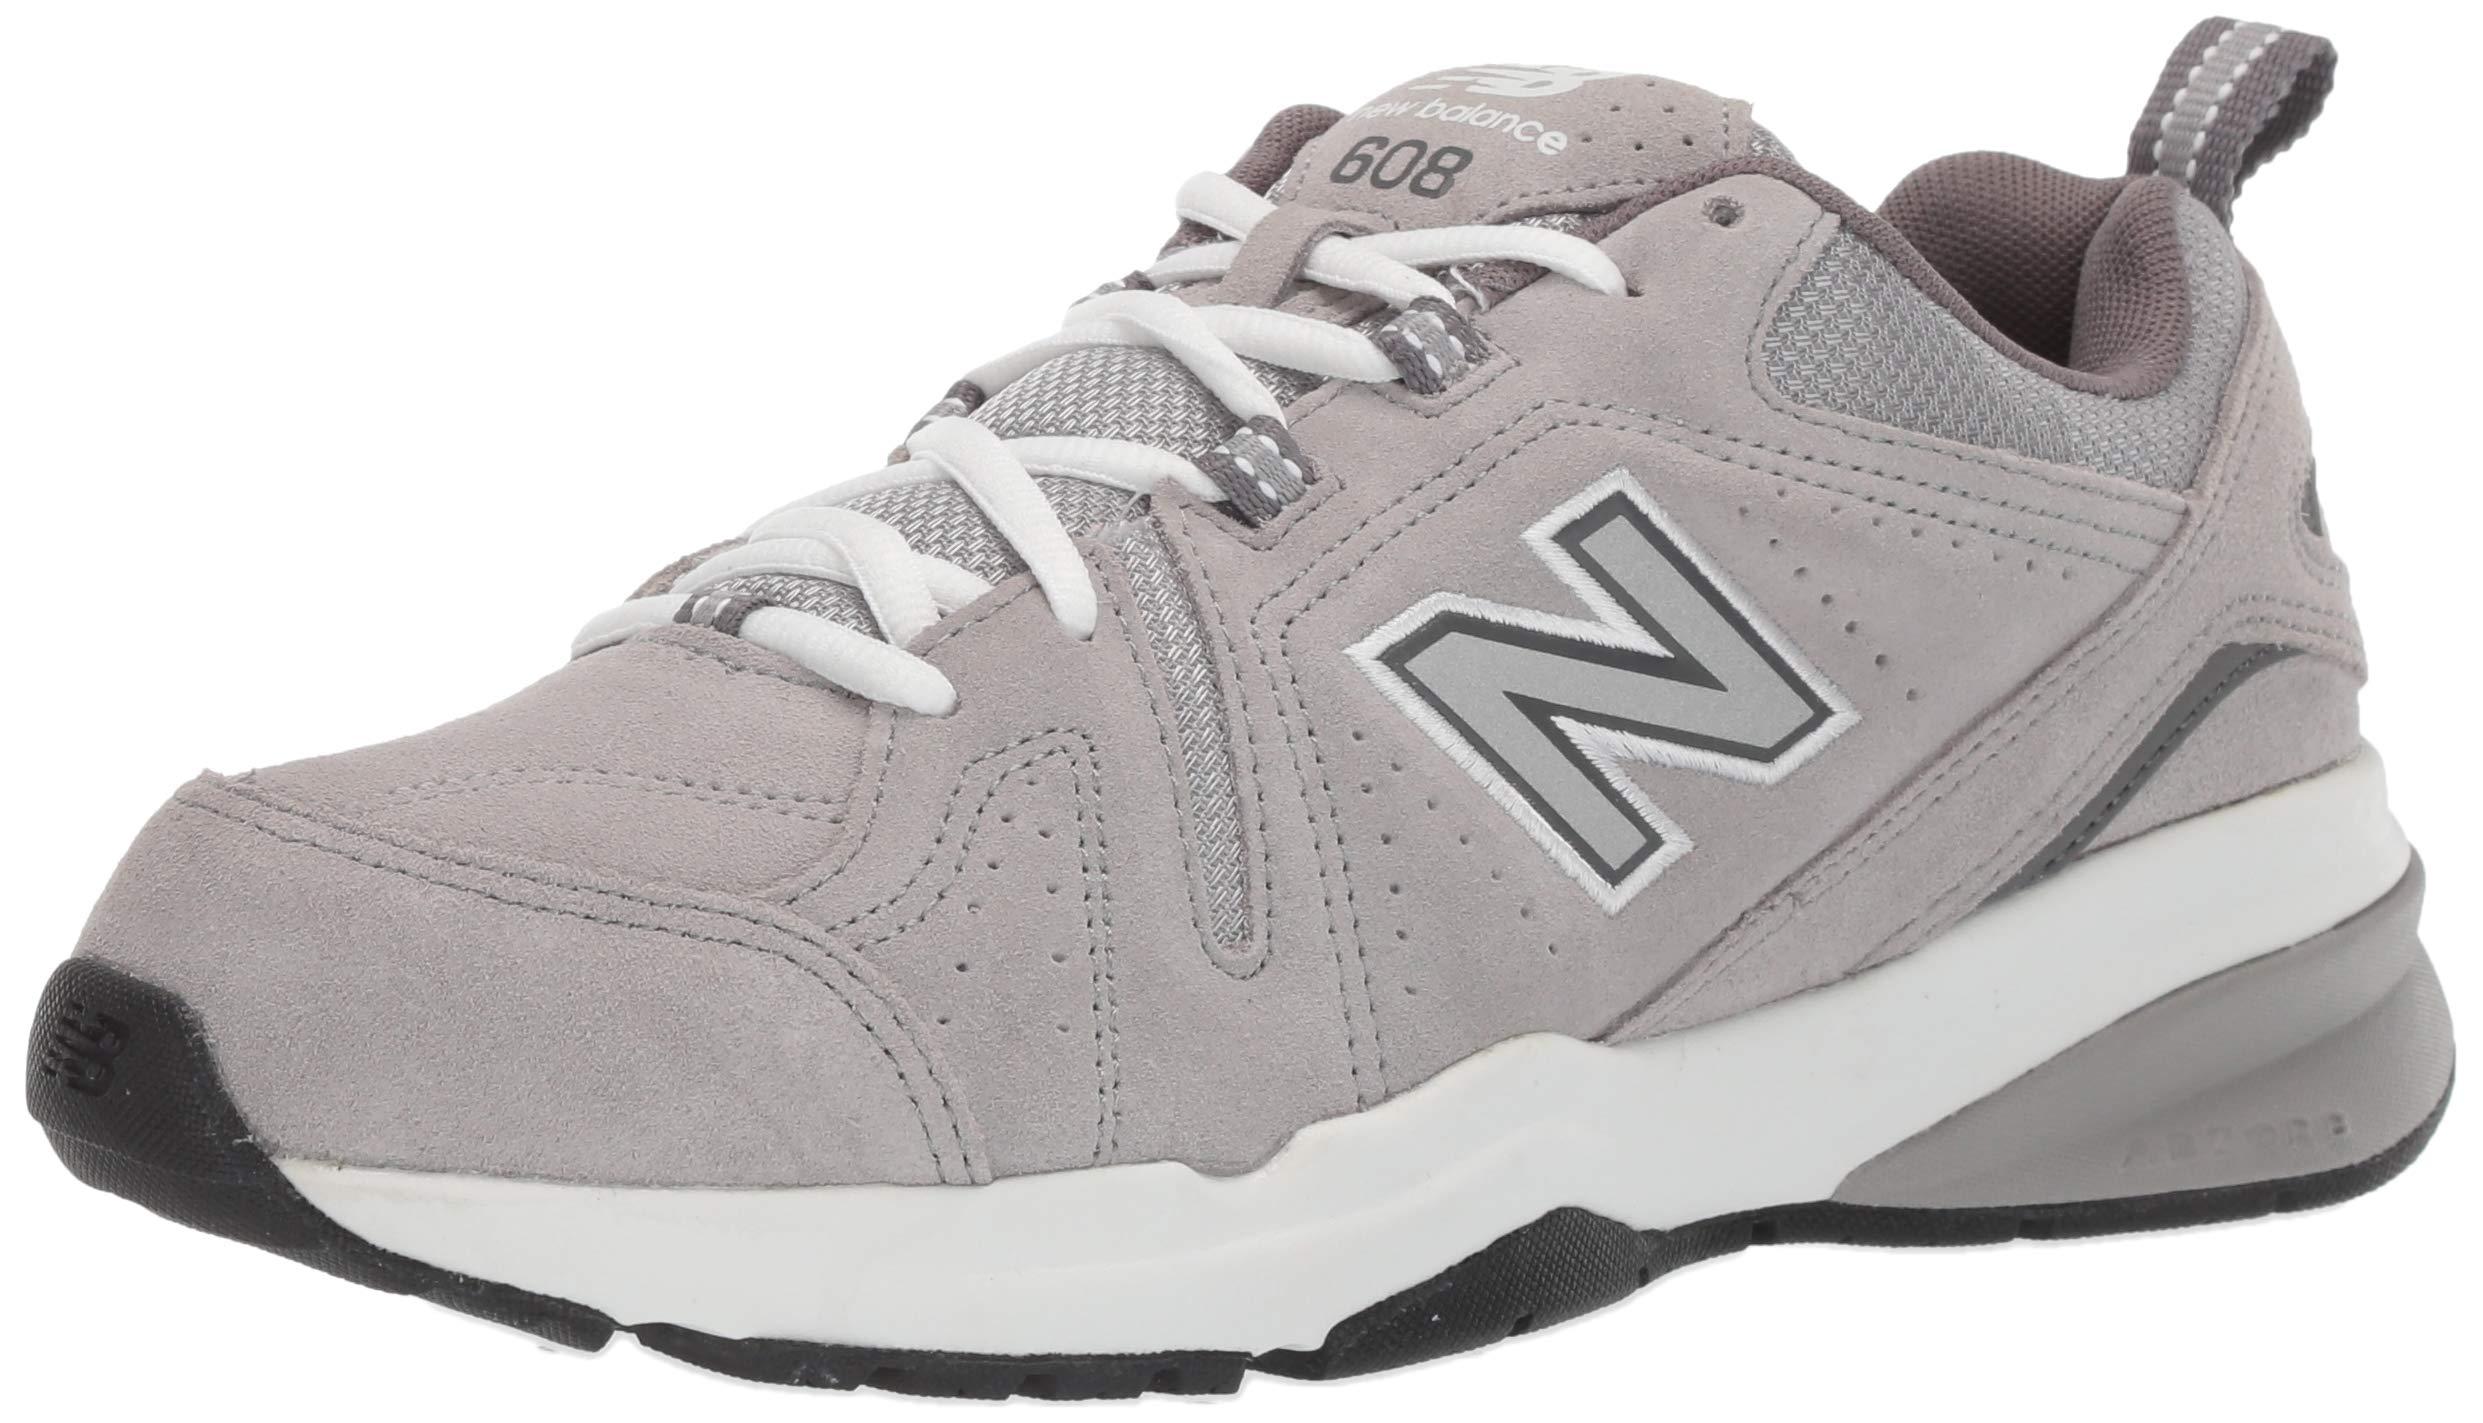 New Balance Men's 608v5 Casual Comfort Running Shoe, Grey Suede, 6.5 D US